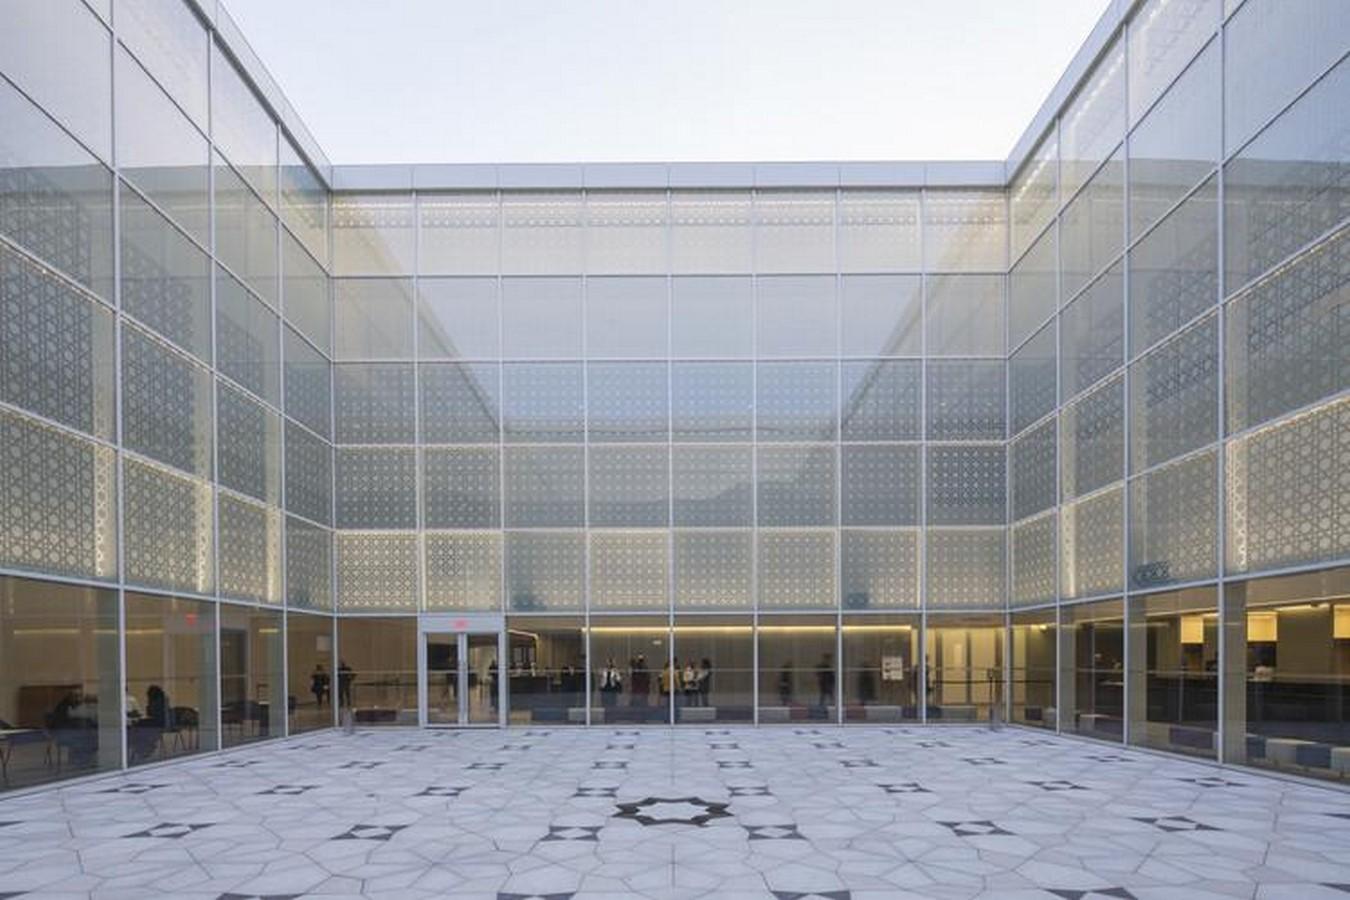 Aga Khan Museum by Fumihiko Maki: Devoted to Islamic art and culture - Sheet7